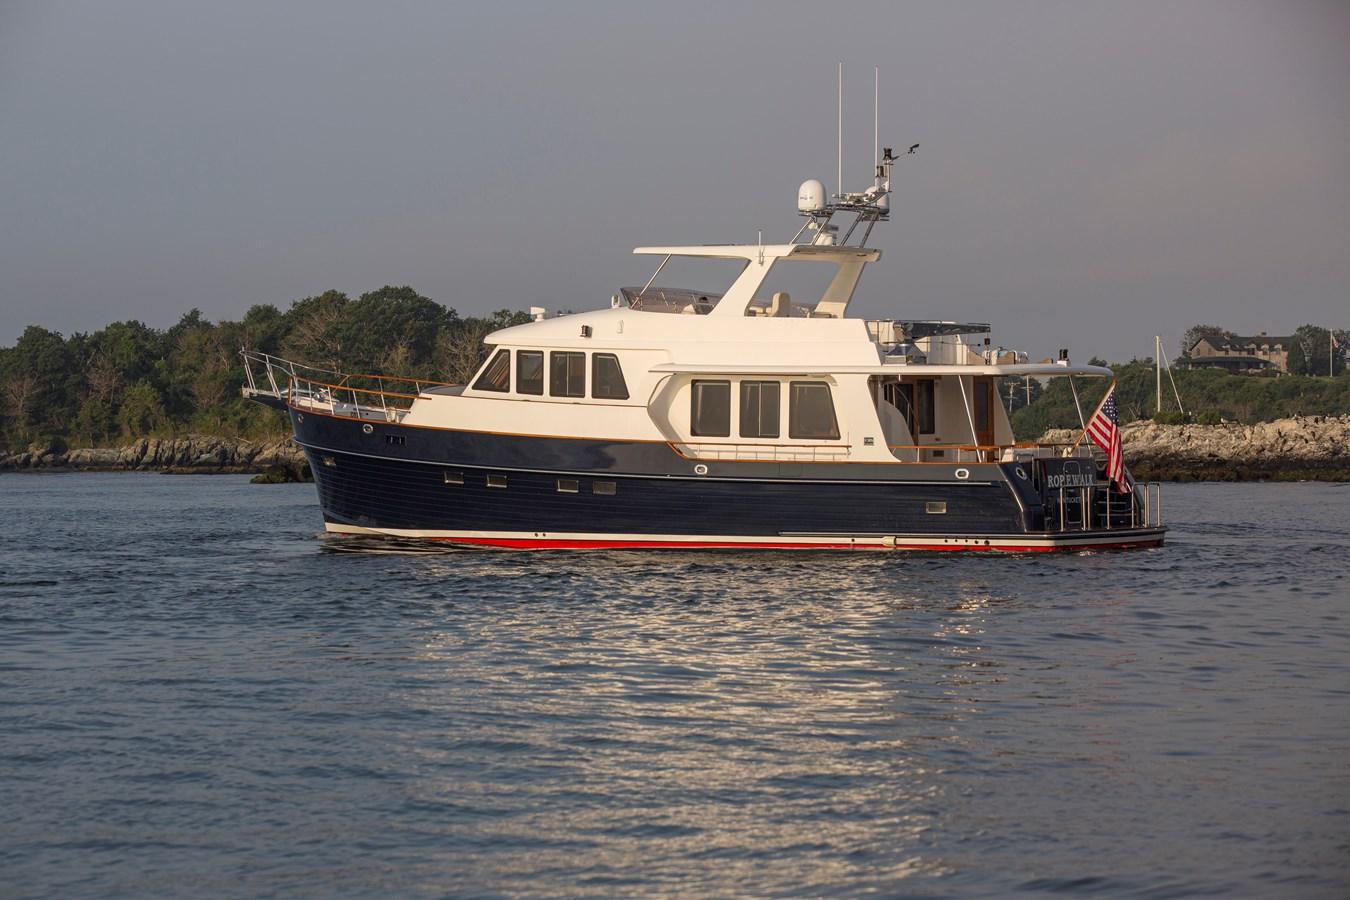 082119BTPN-4437 2006 GRAND BANKS 59 Aleutian RP Motor Yacht 2877631